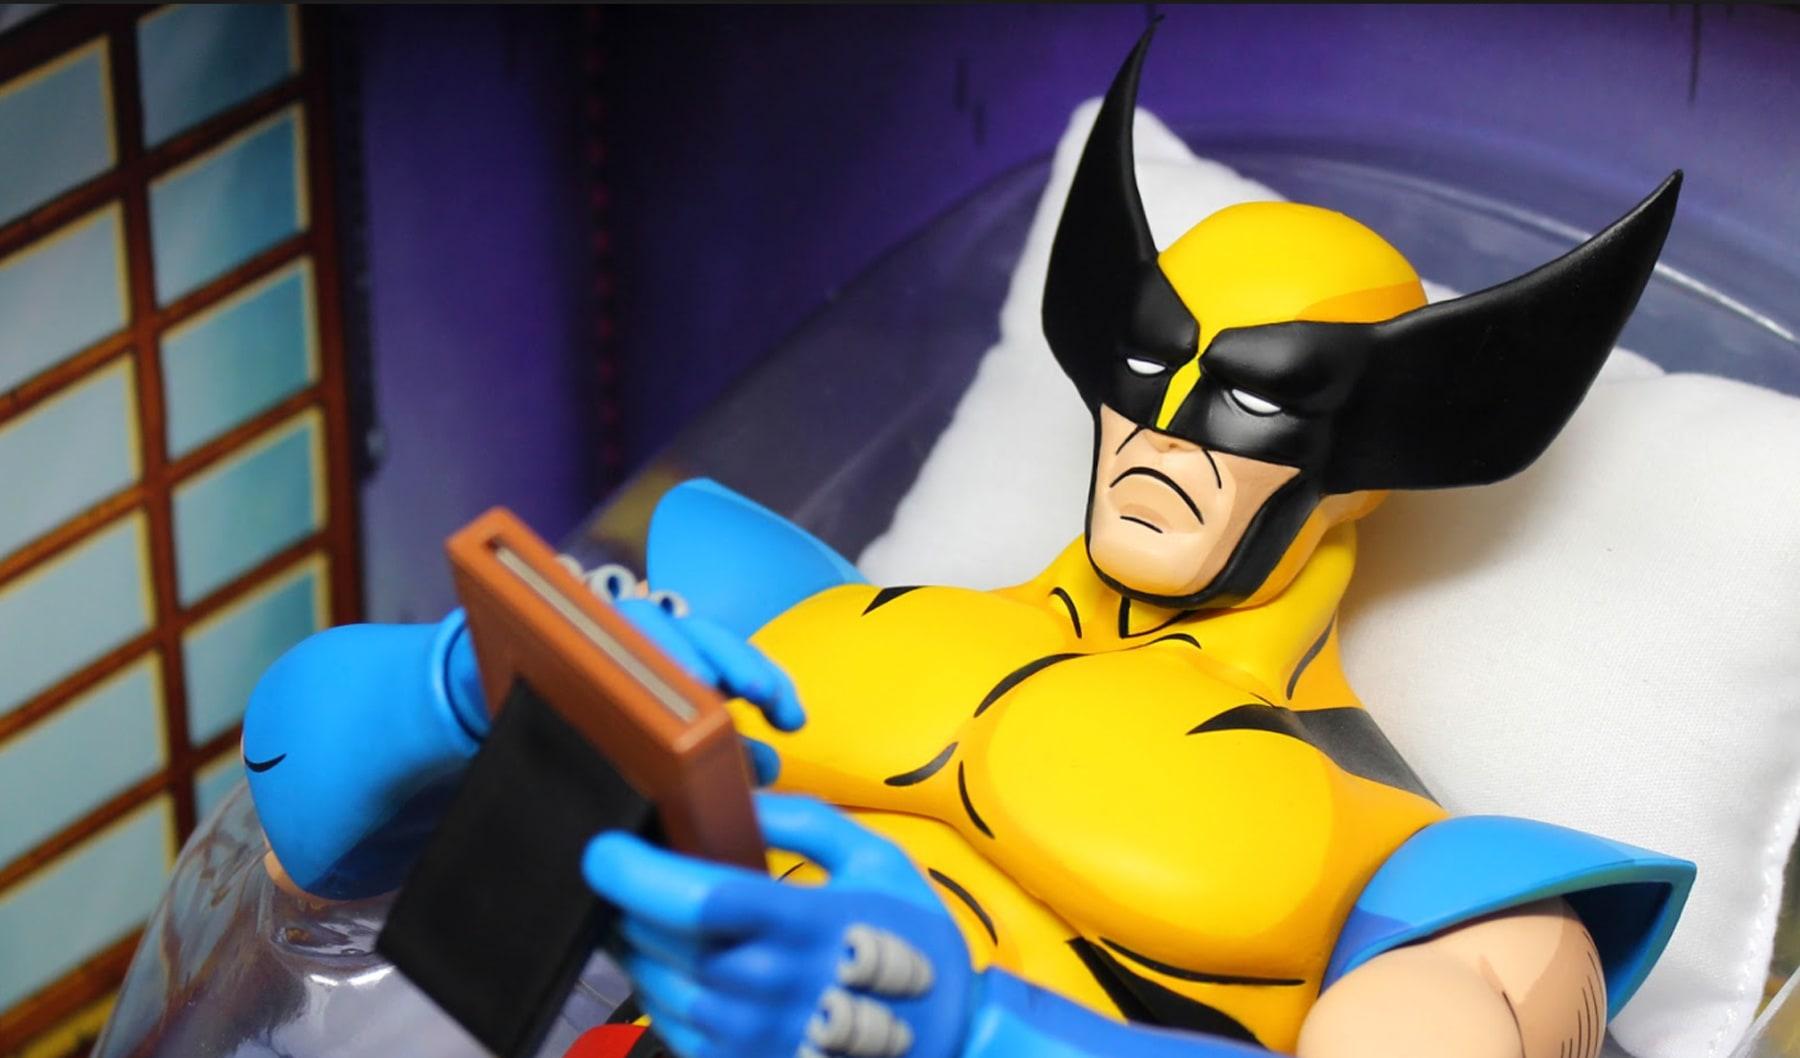 Mondo The Sad Wolverine meme action figure